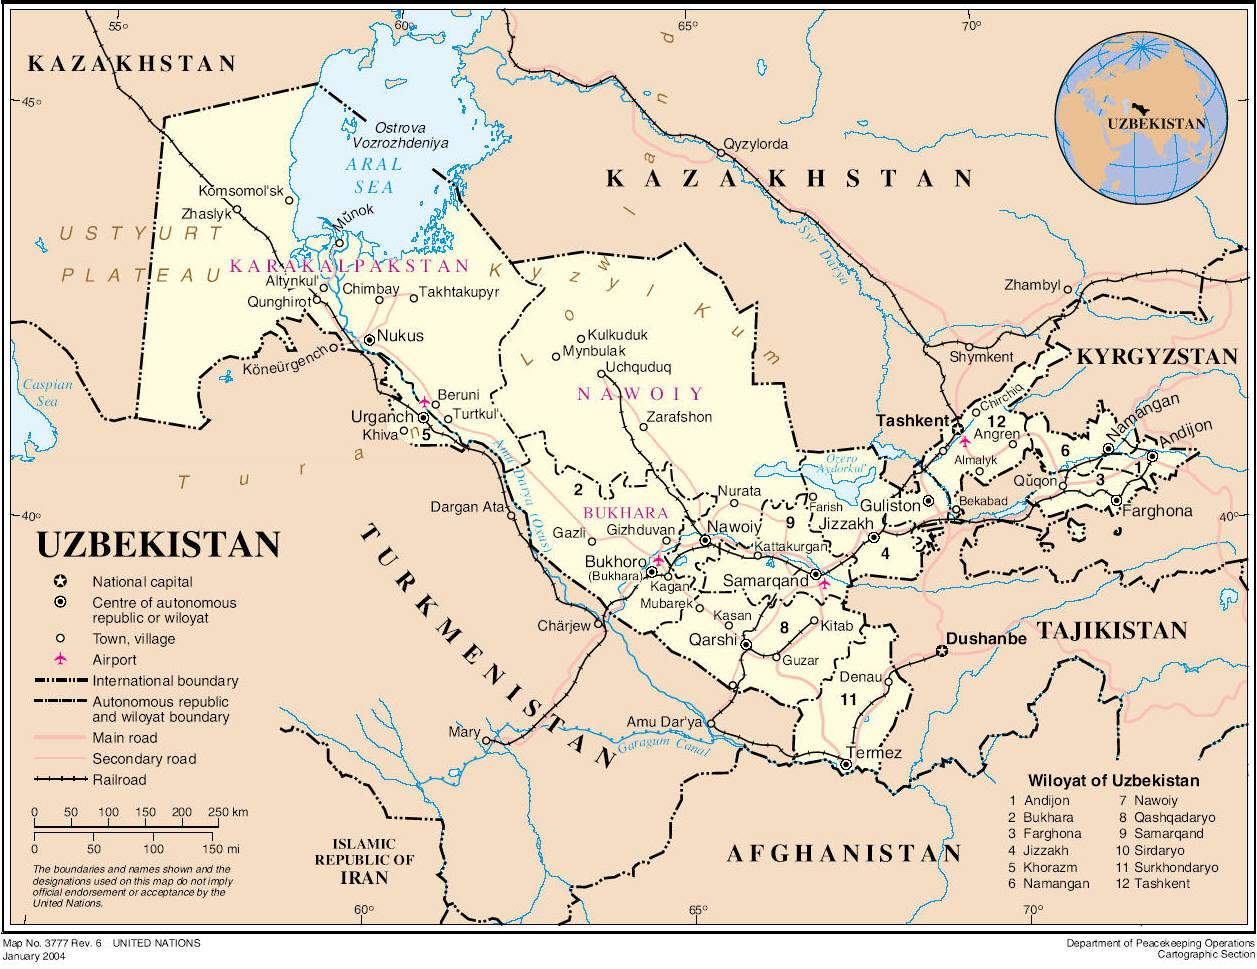 La mappa dell'Uzbekistan